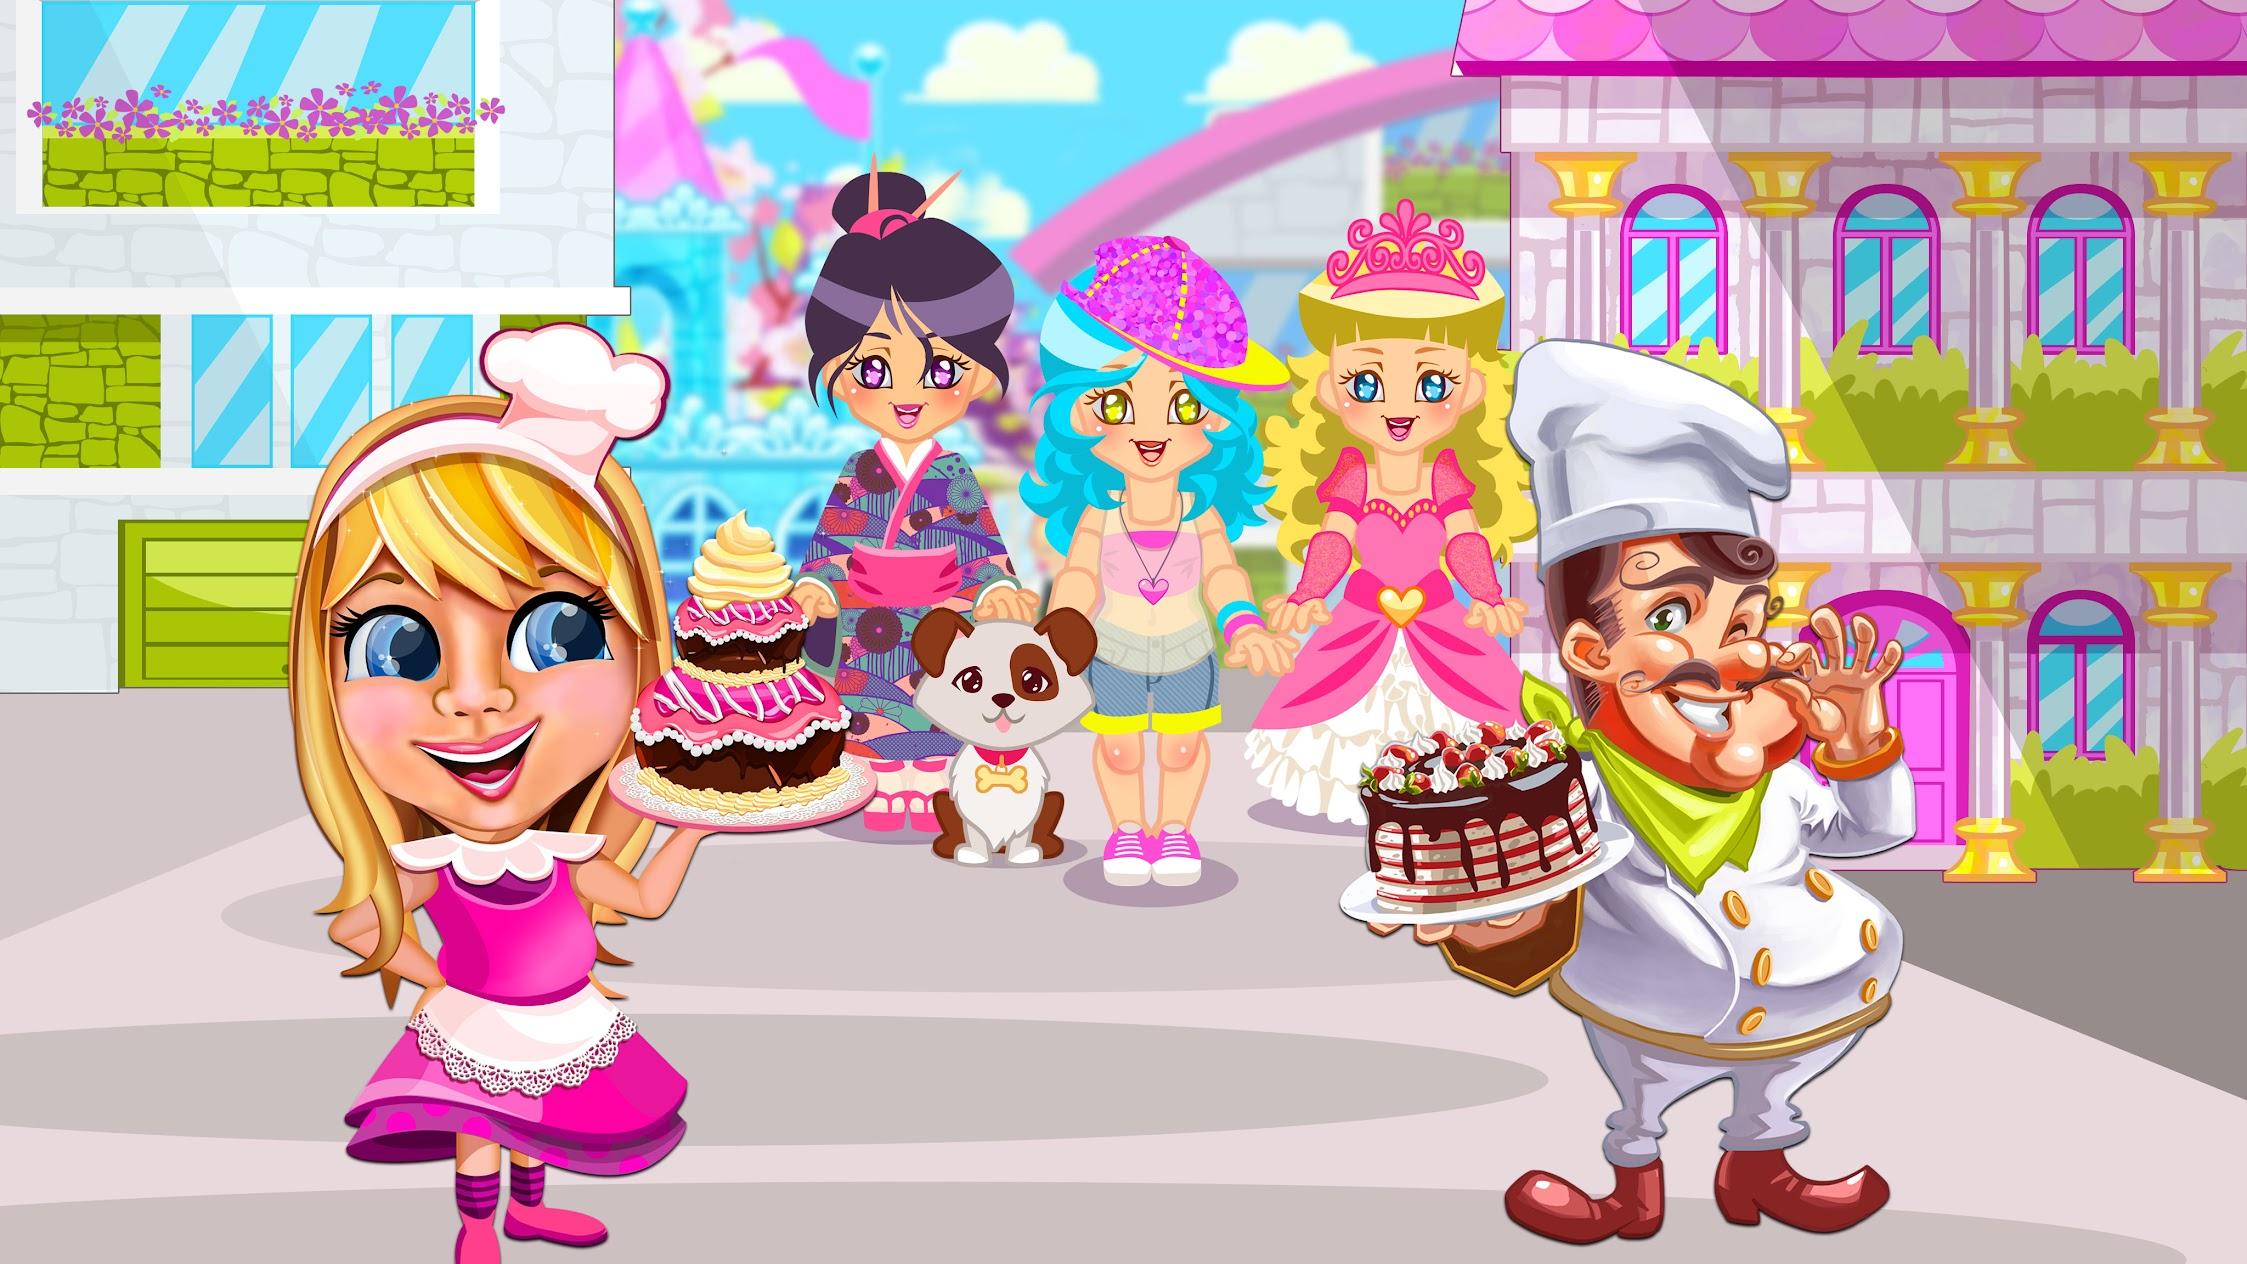 Lollipop Studio - Premium Games and Applications